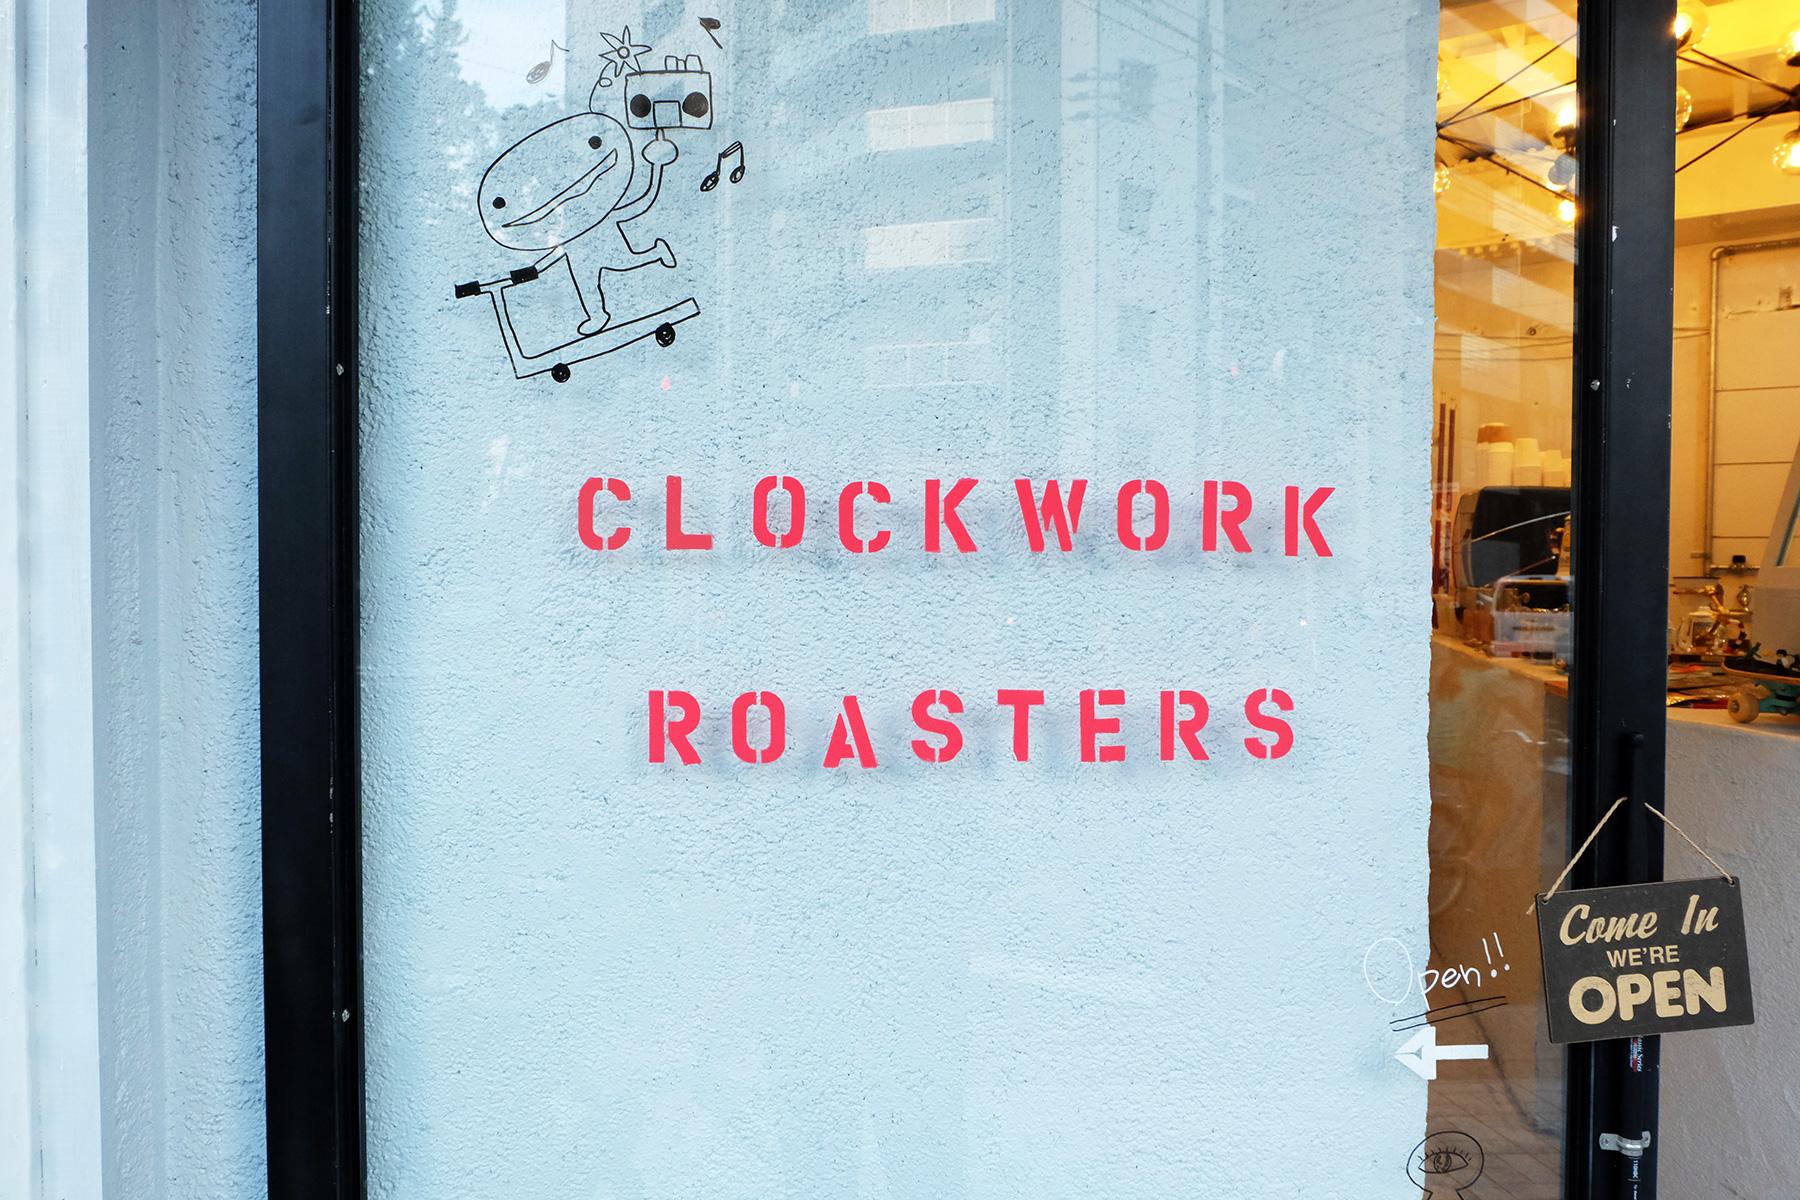 CLOCKWORK ROASTERS クロックワーク ロースターズ